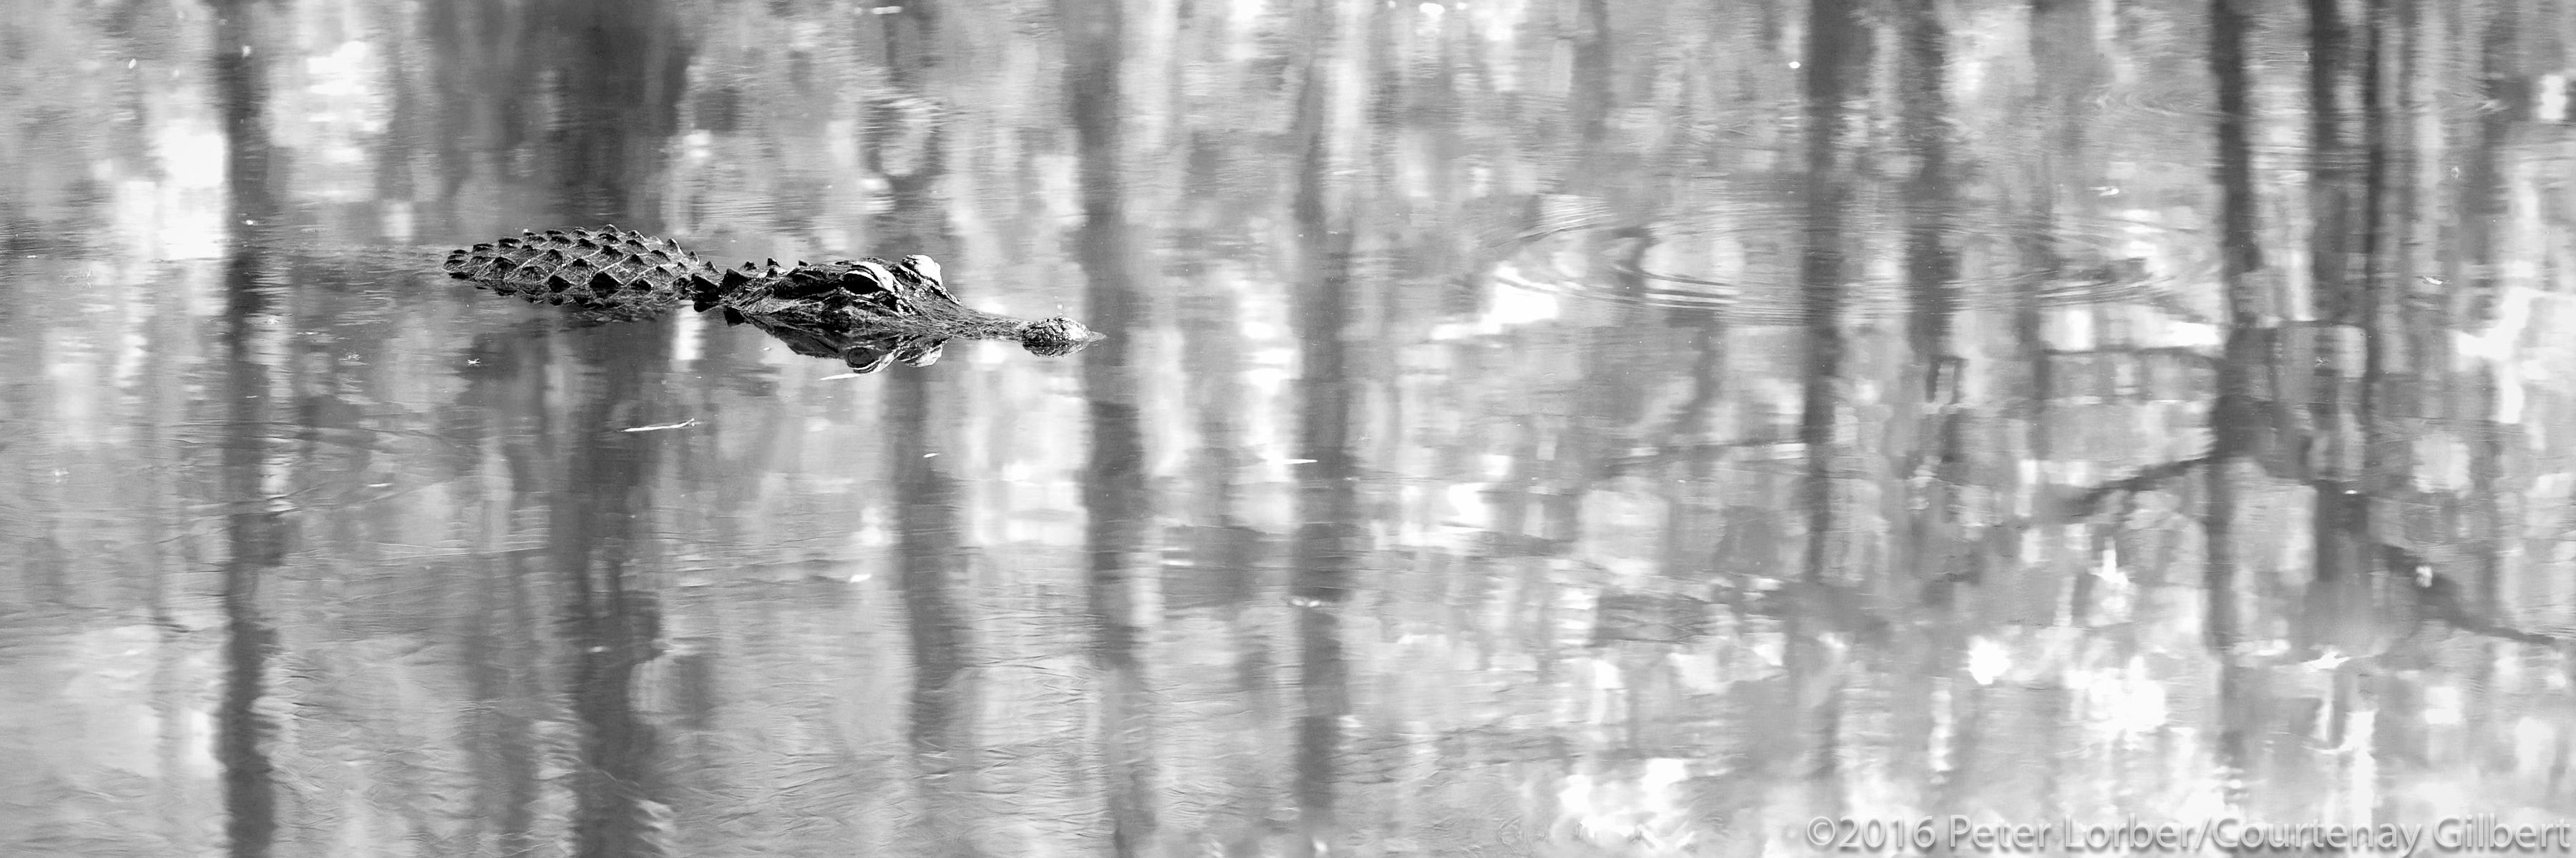 Alligator Reflections